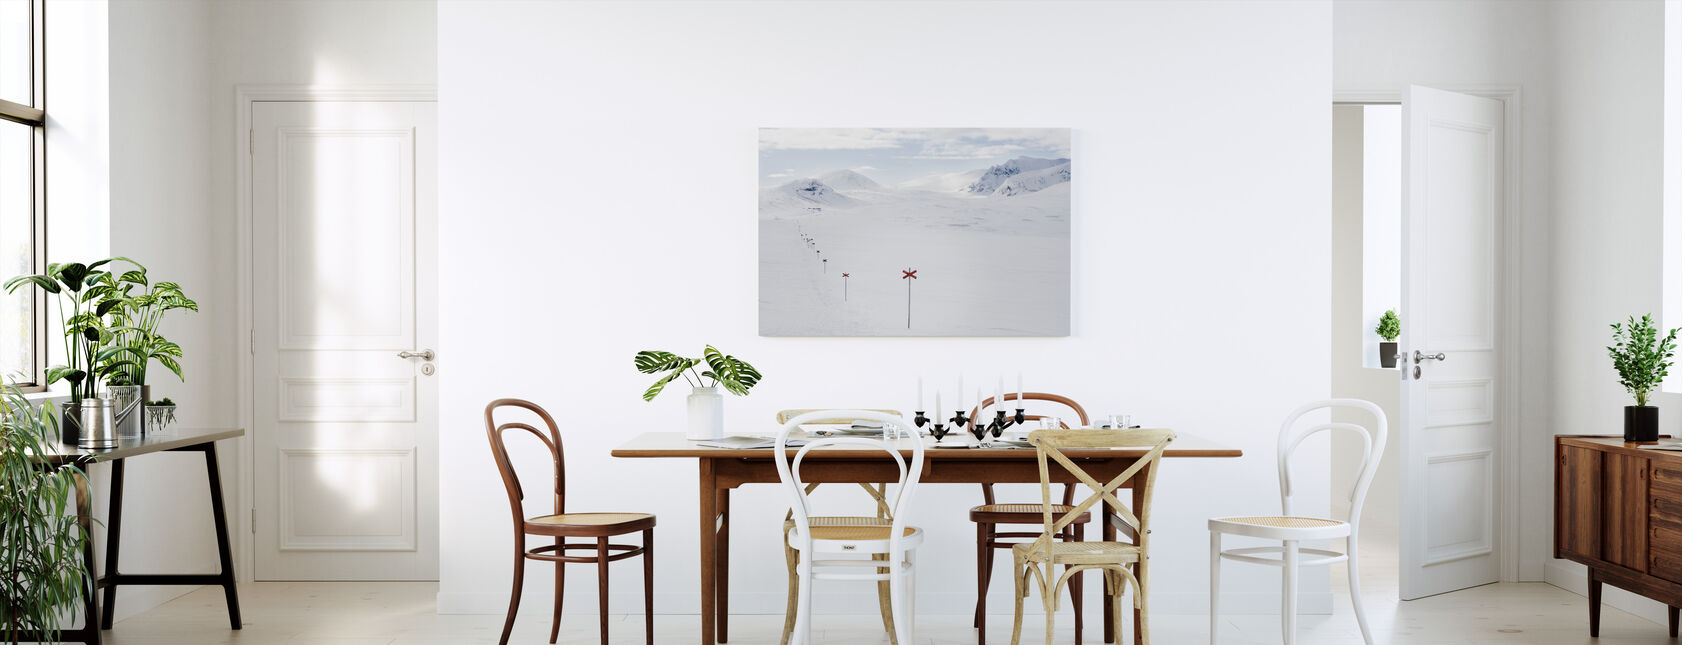 Vandringsled i Sylarna, Sverige - Canvastavla - Kök